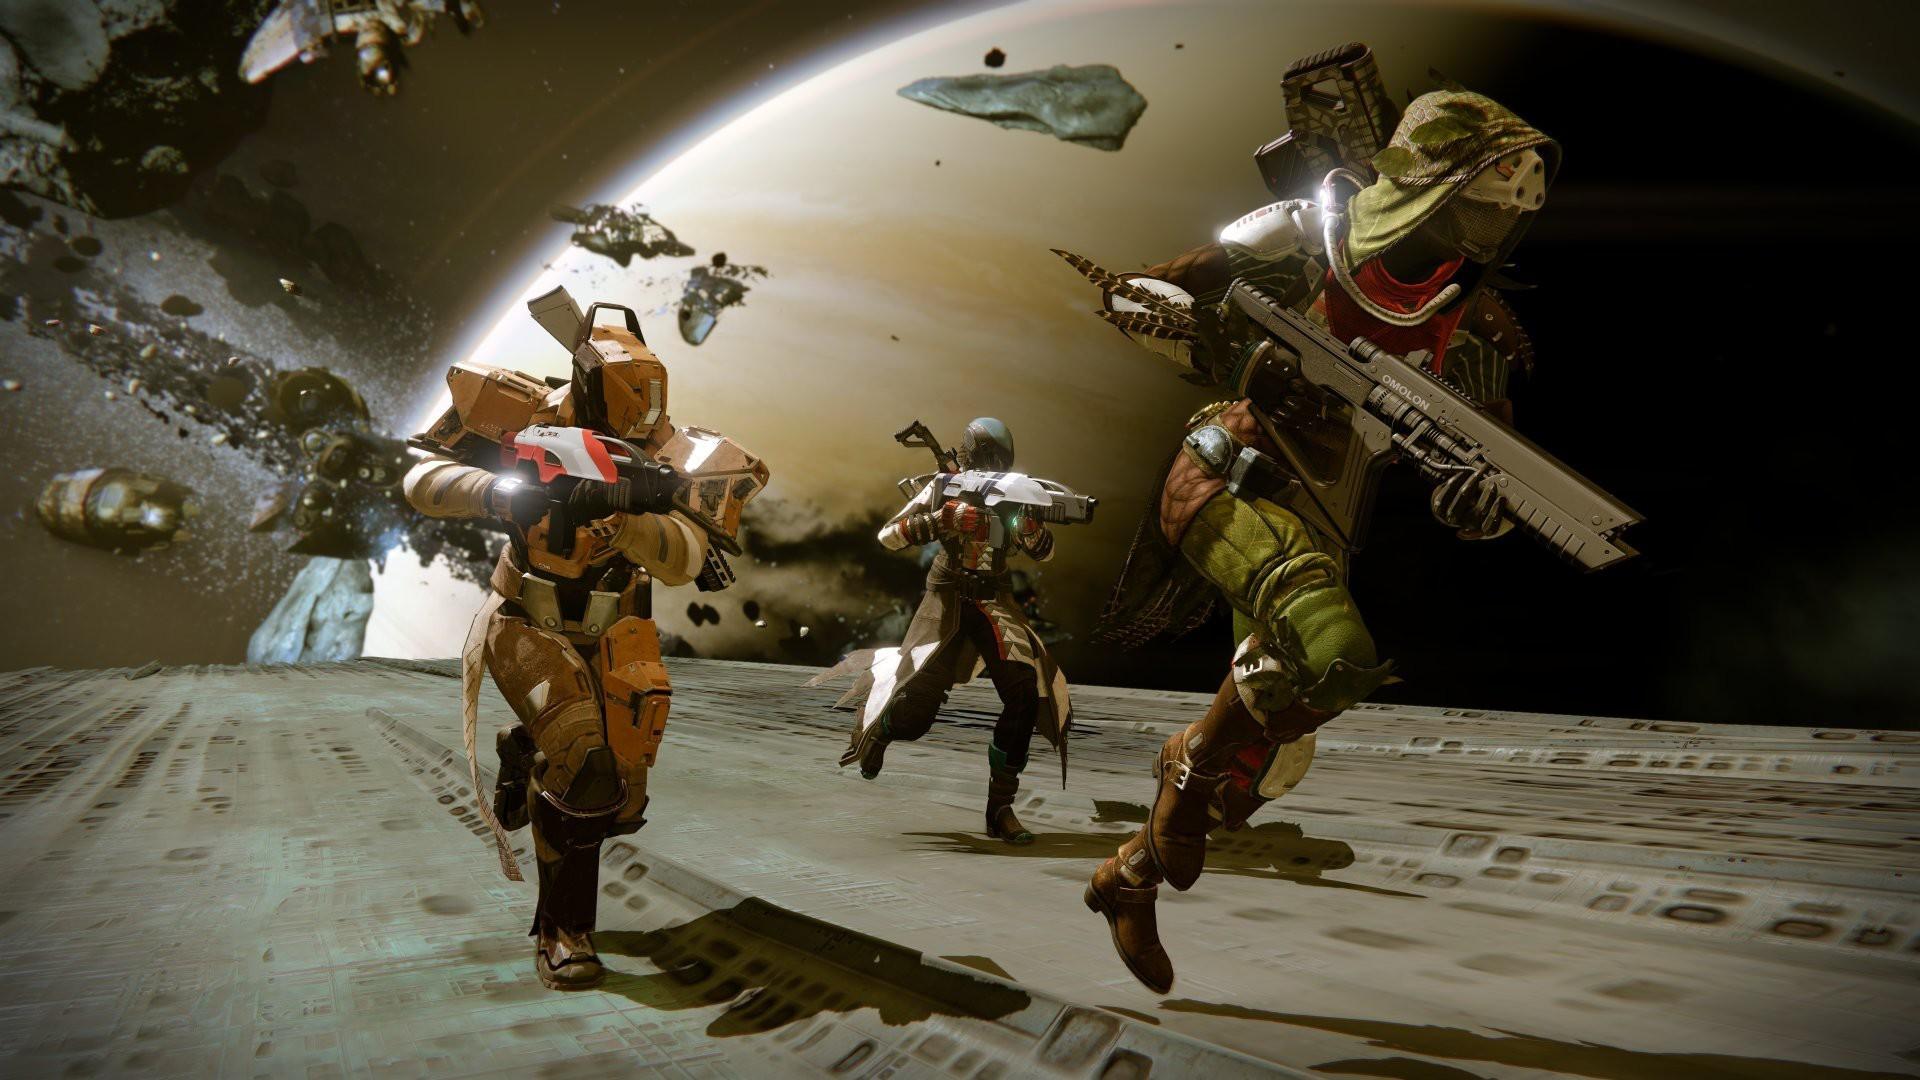 Destiny: The Taken King Review – Braxton Haugen